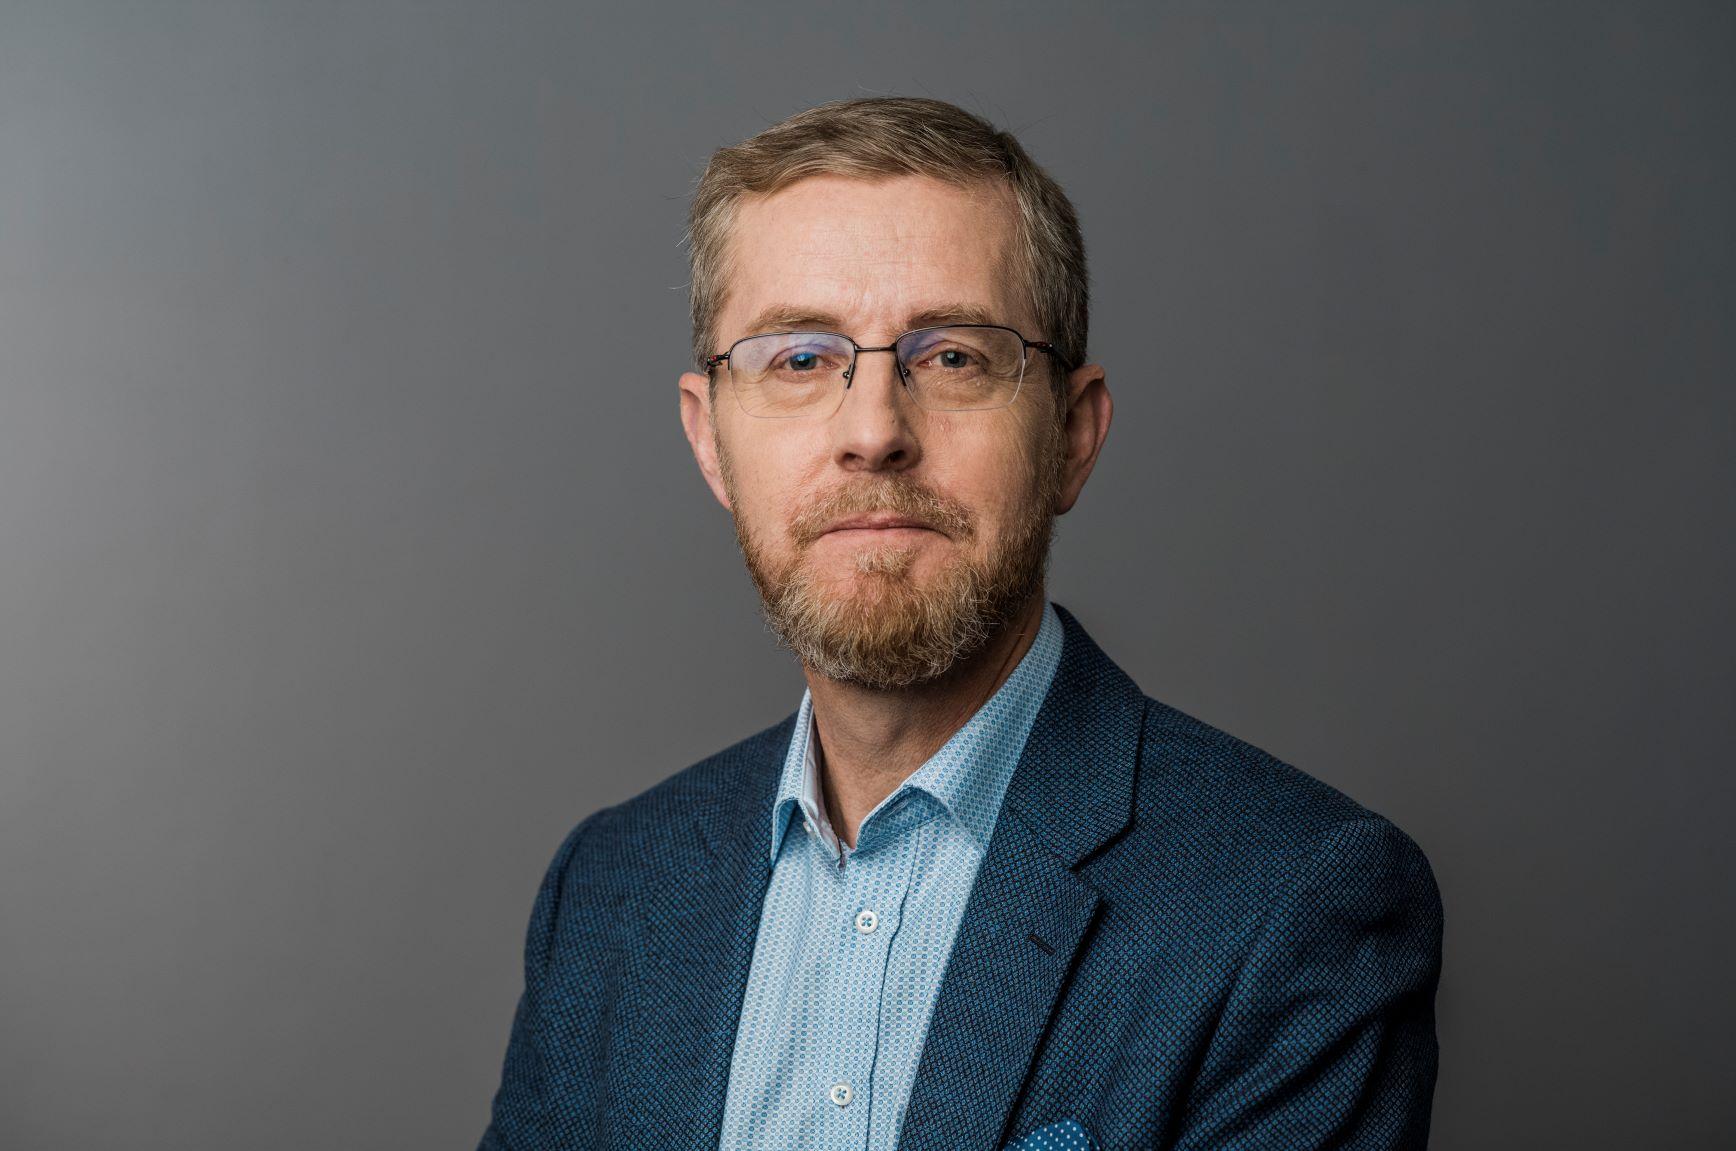 Seniorrådgiver Olav Eikemo.